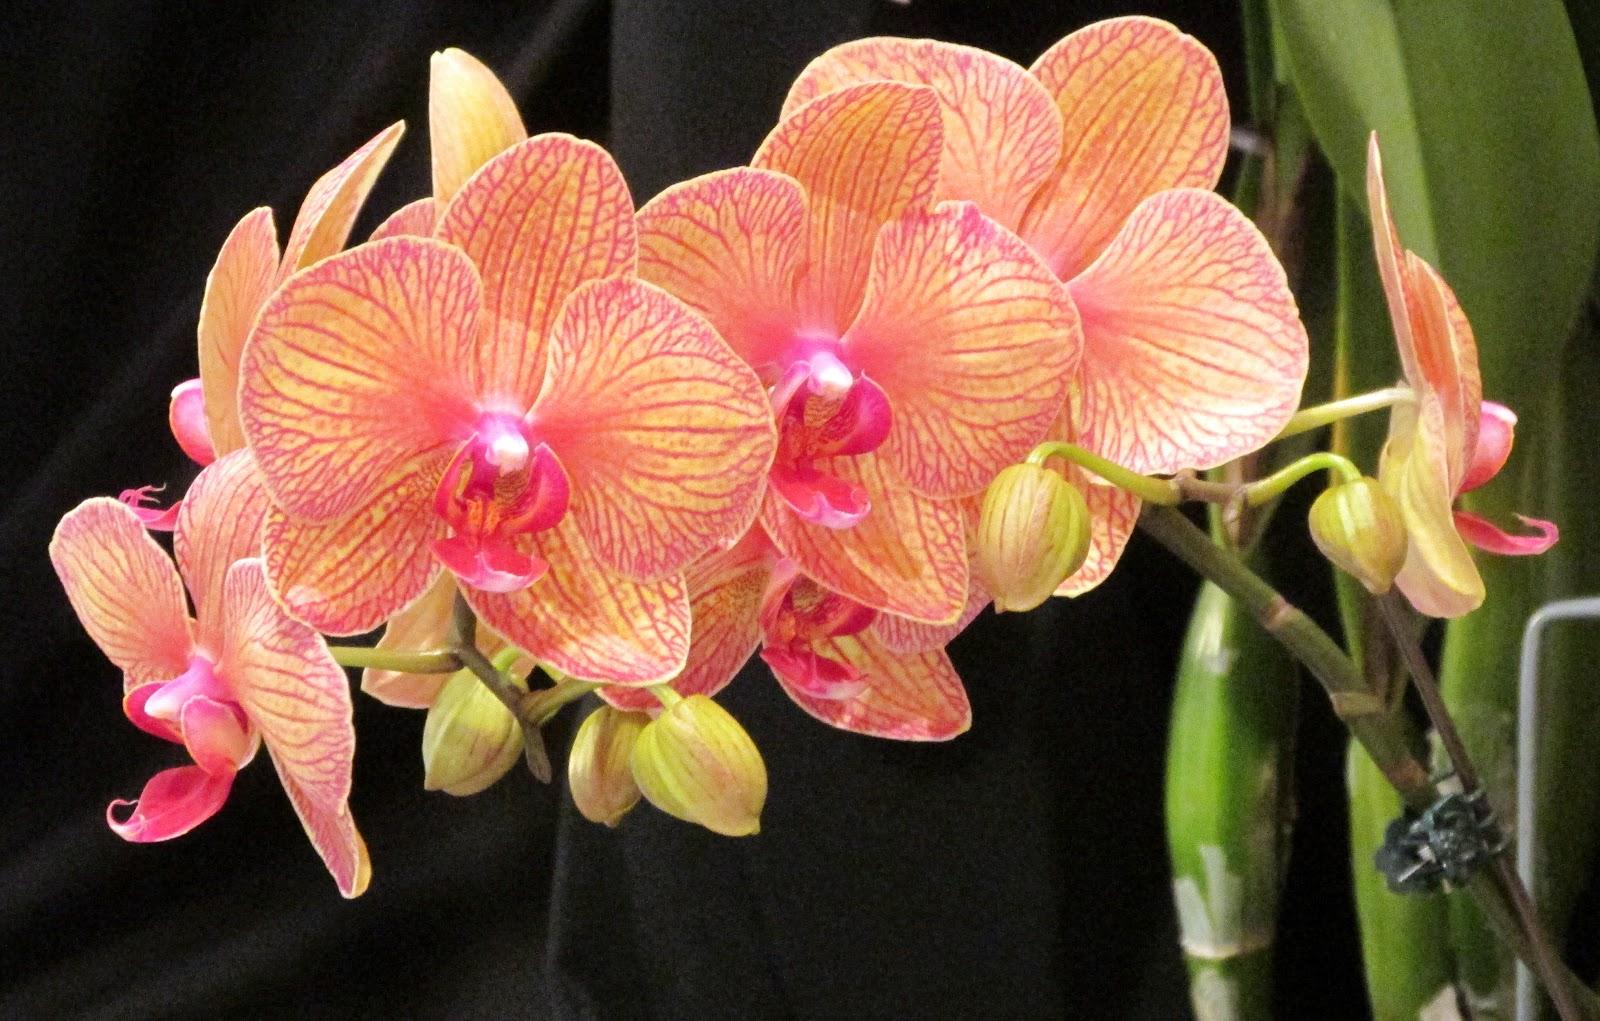 Planta del mes de Gener: Phalaenopsis amb un 25% de descompte.